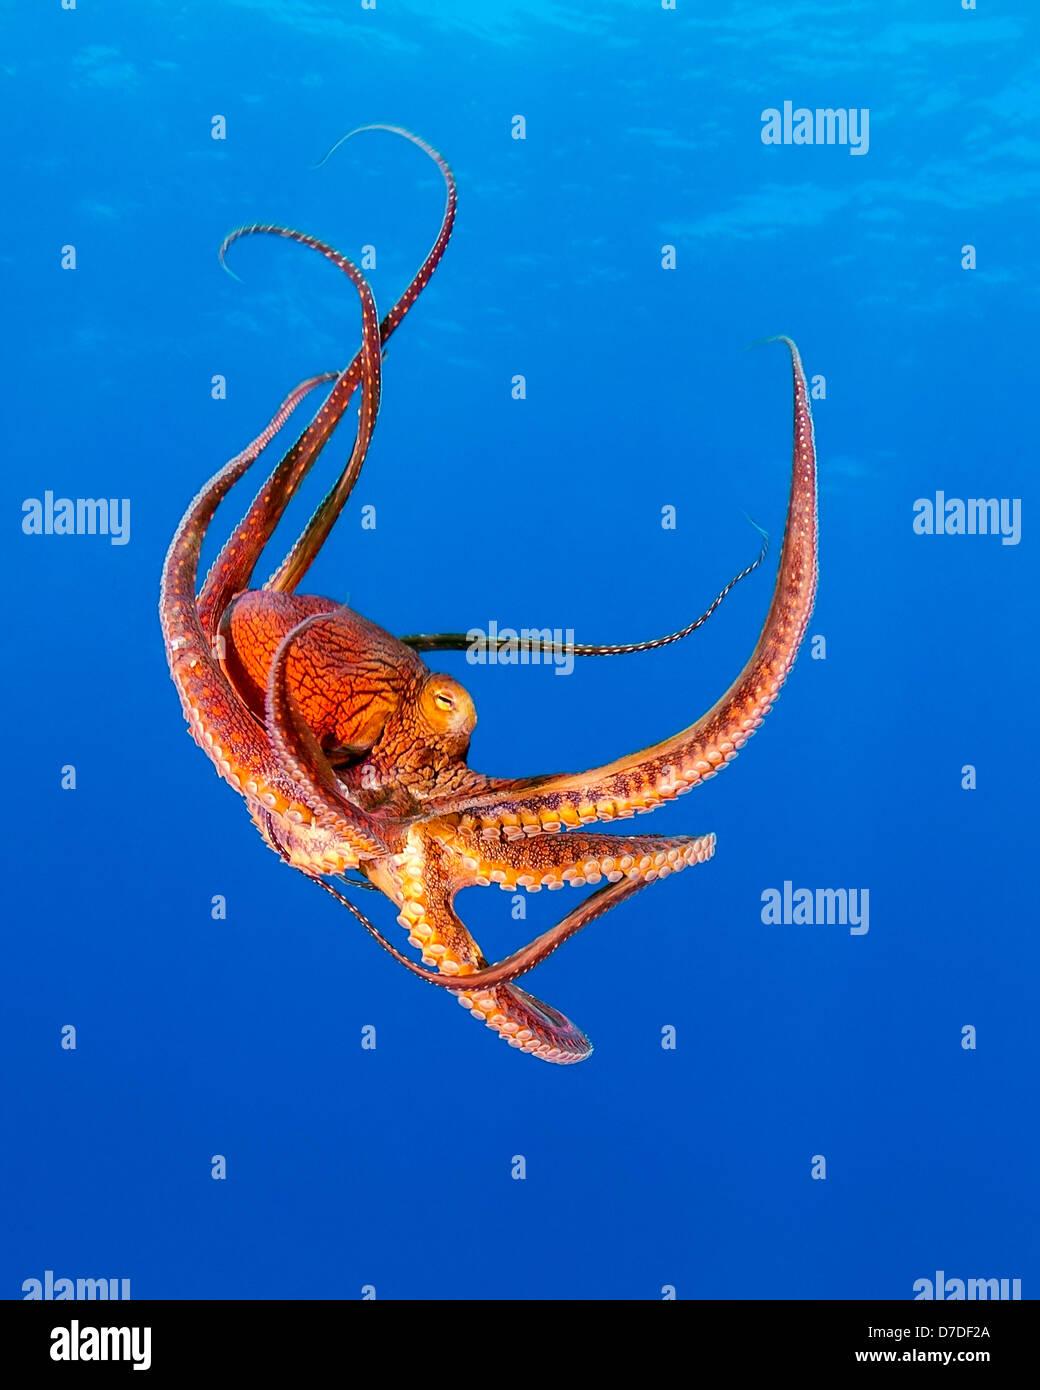 Giorno di polpo, Octopus cyanea, Kohala Coast, Big Island, Hawaii, STATI UNITI D'AMERICA Immagini Stock